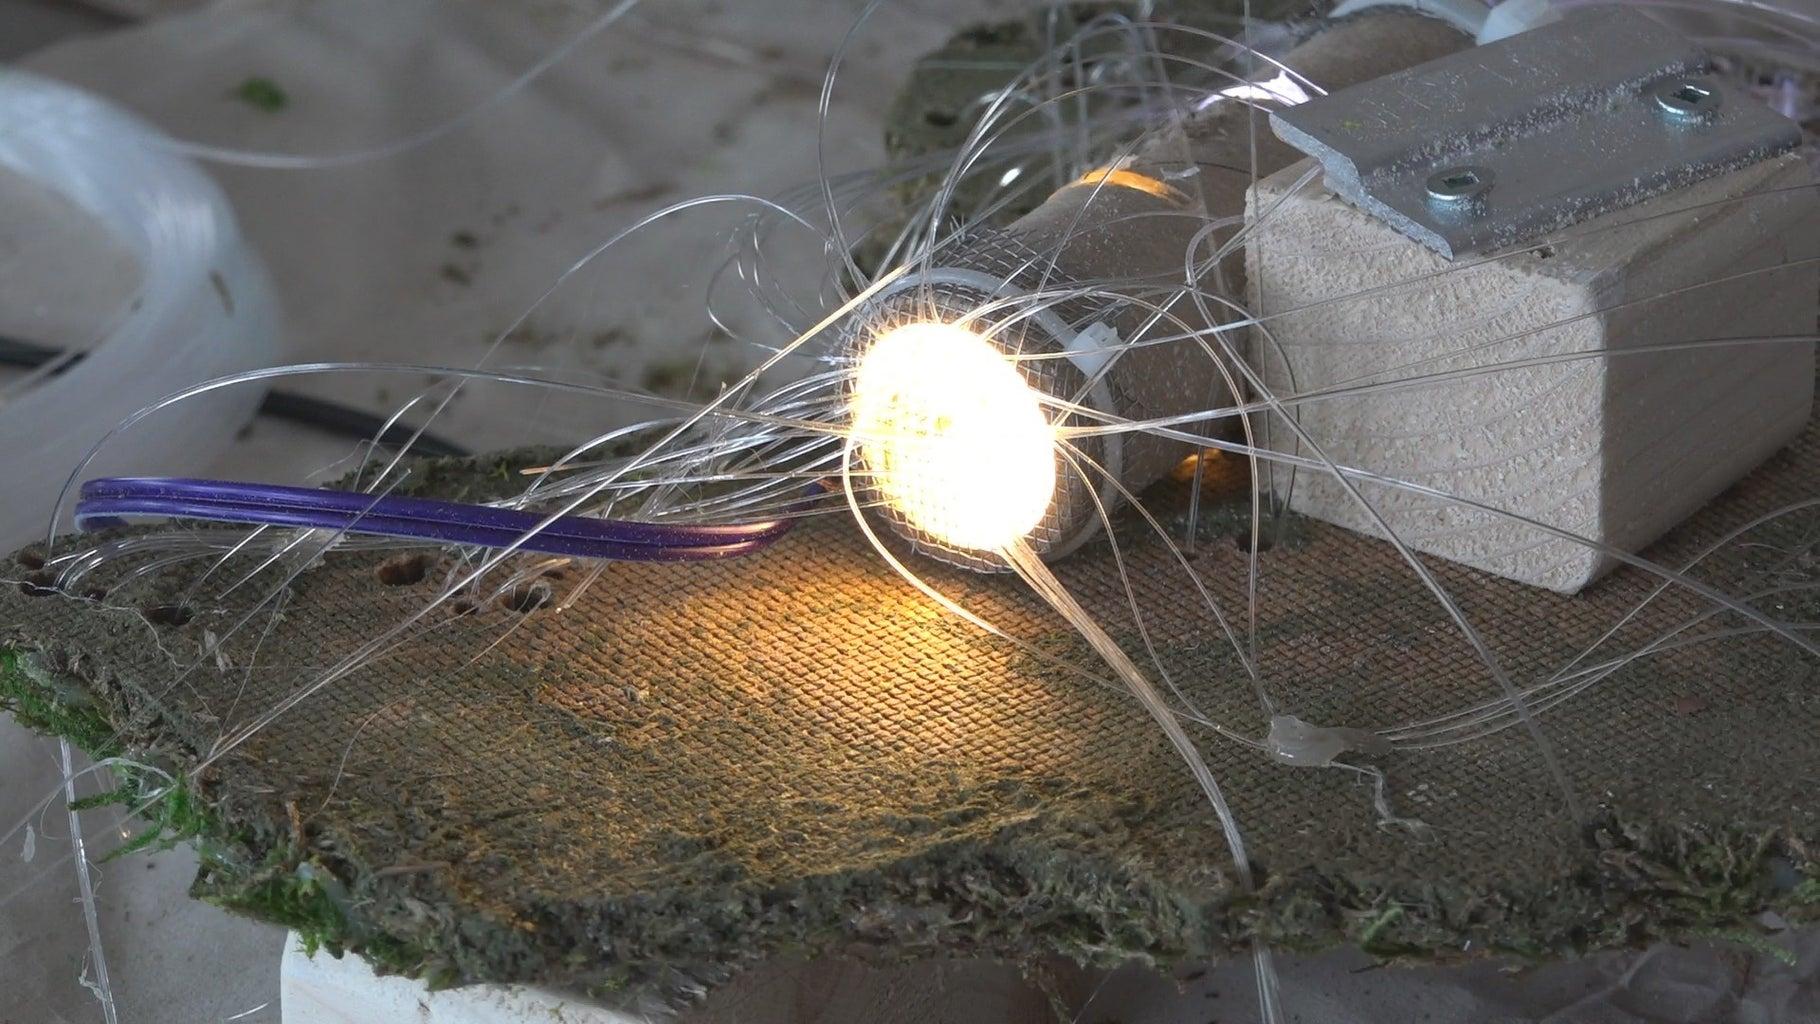 Stringing the Fiber Optic Light Filaments